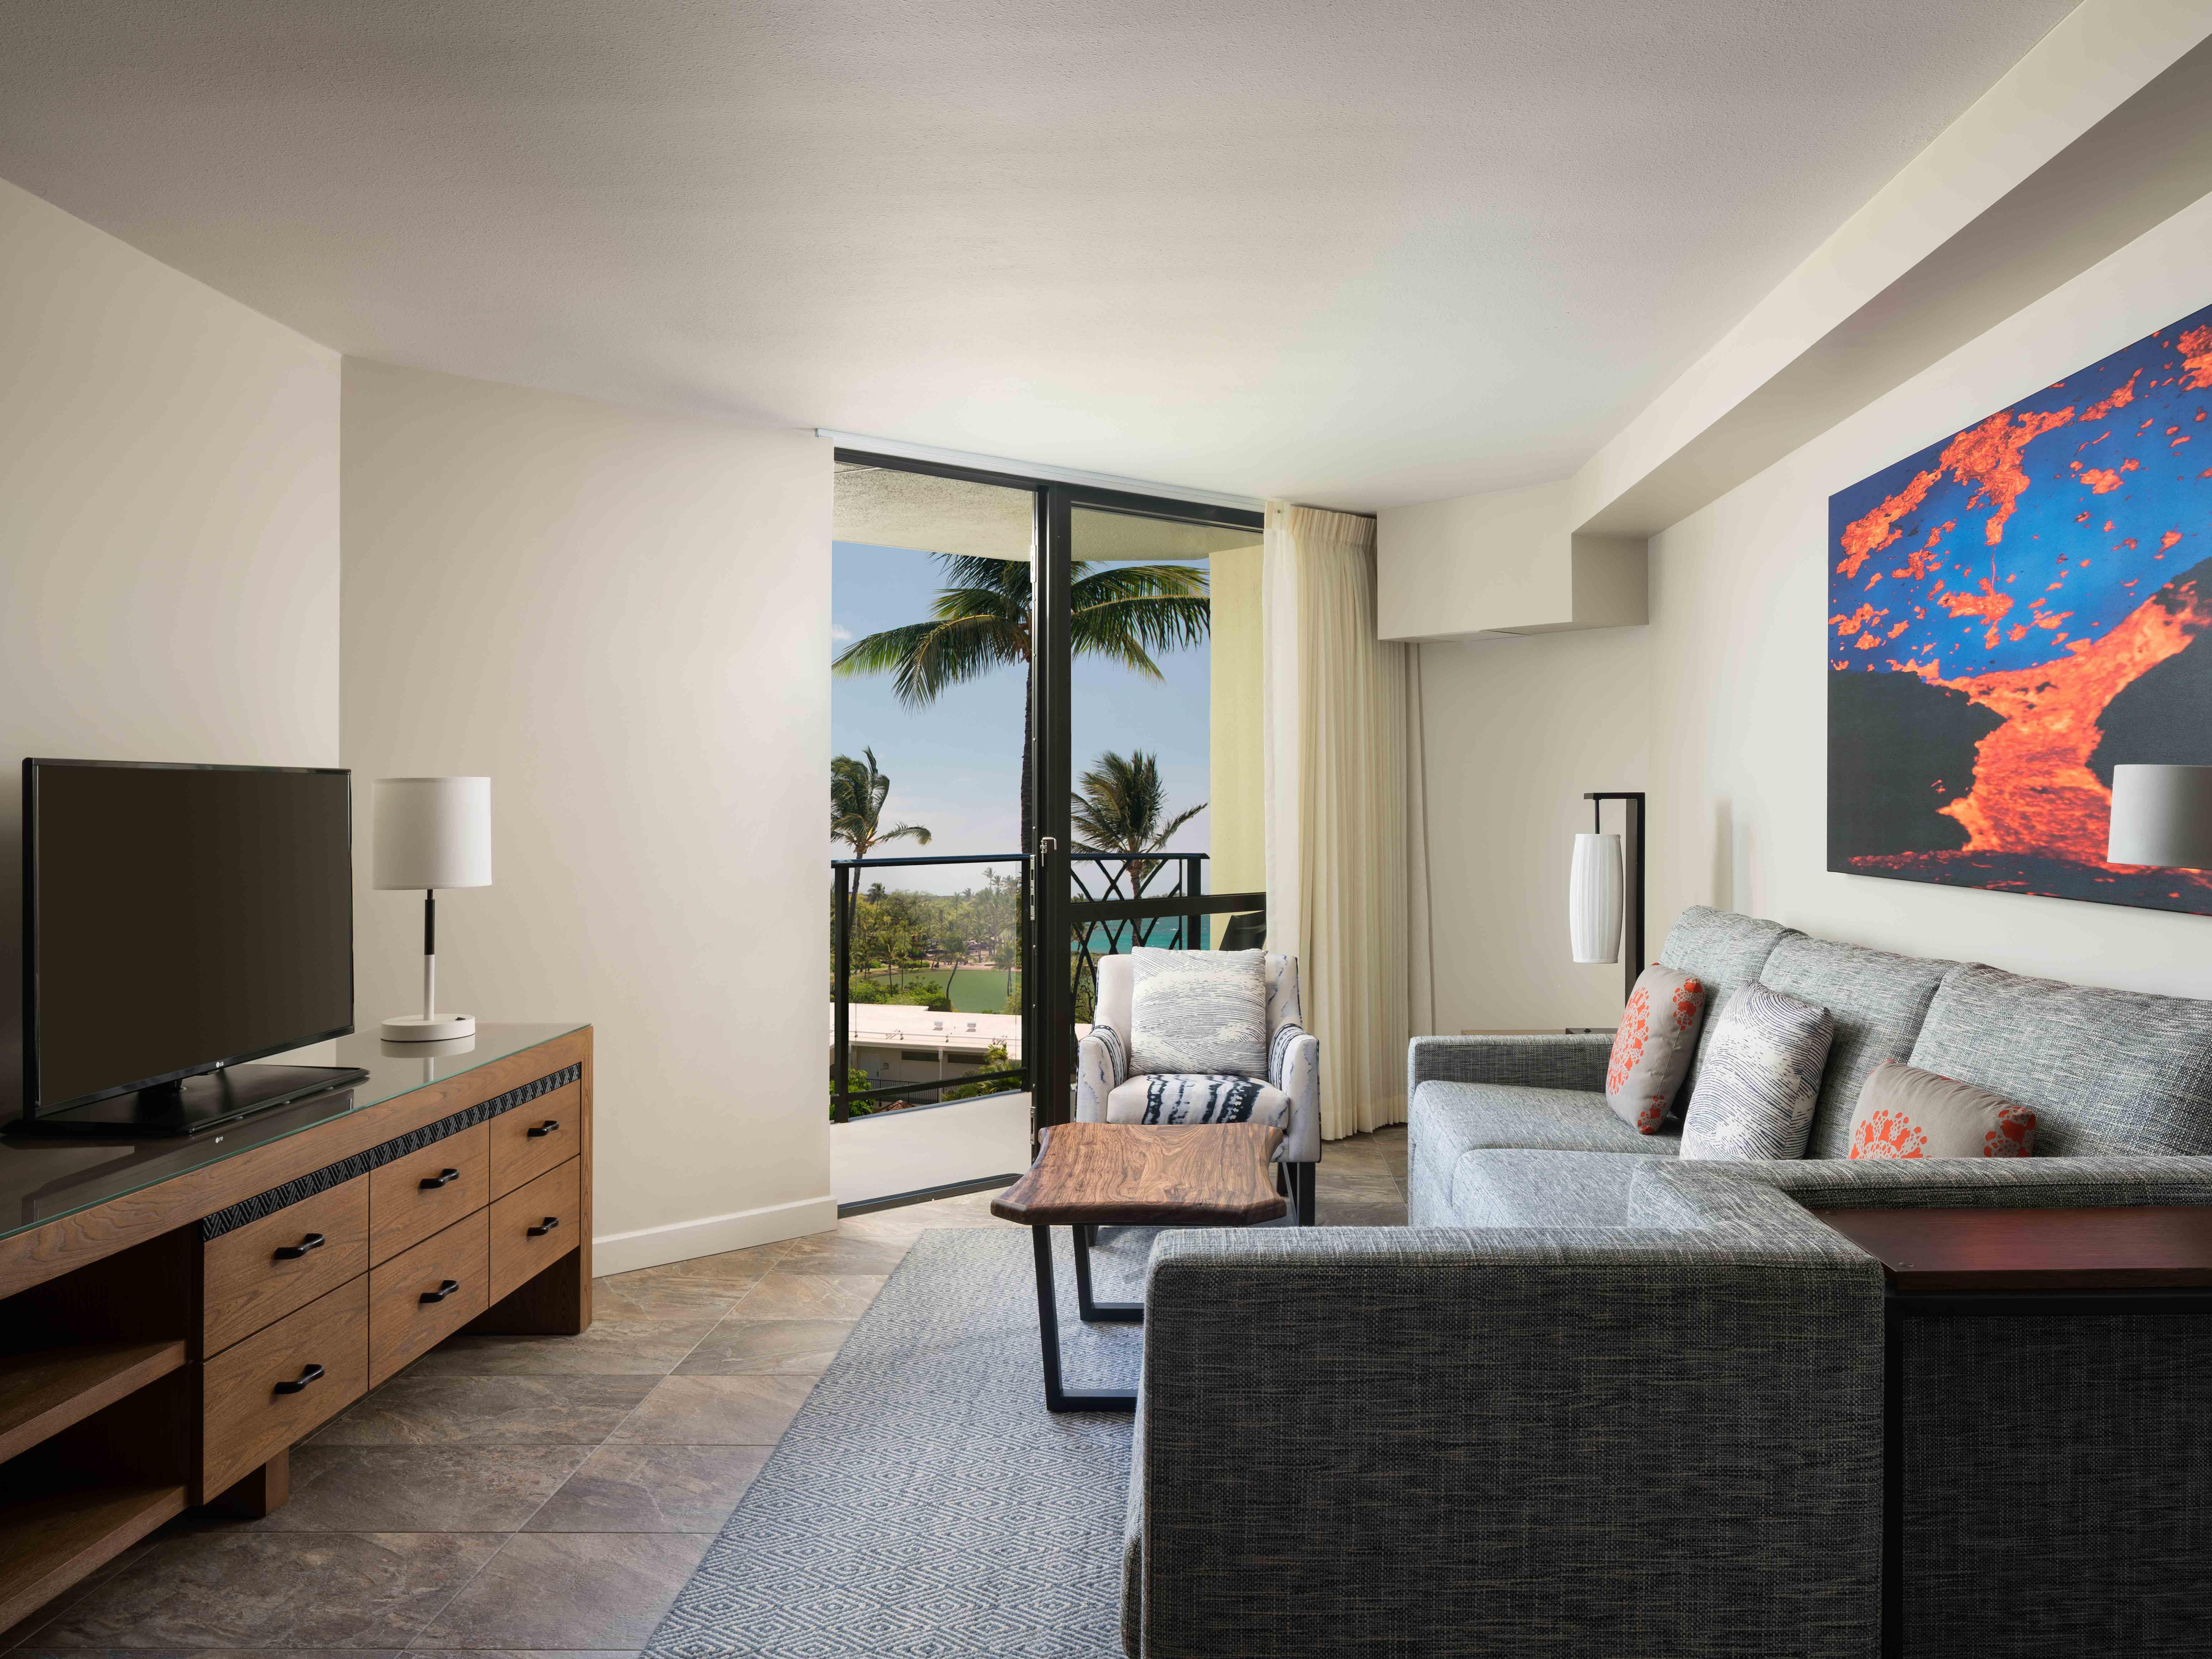 Marriott's Waikoloa Ocean Club Villa Living Room. Marriott's Waikoloa Ocean Club is located in Waikoloa Beach, Big Island, Hawai'i United States.